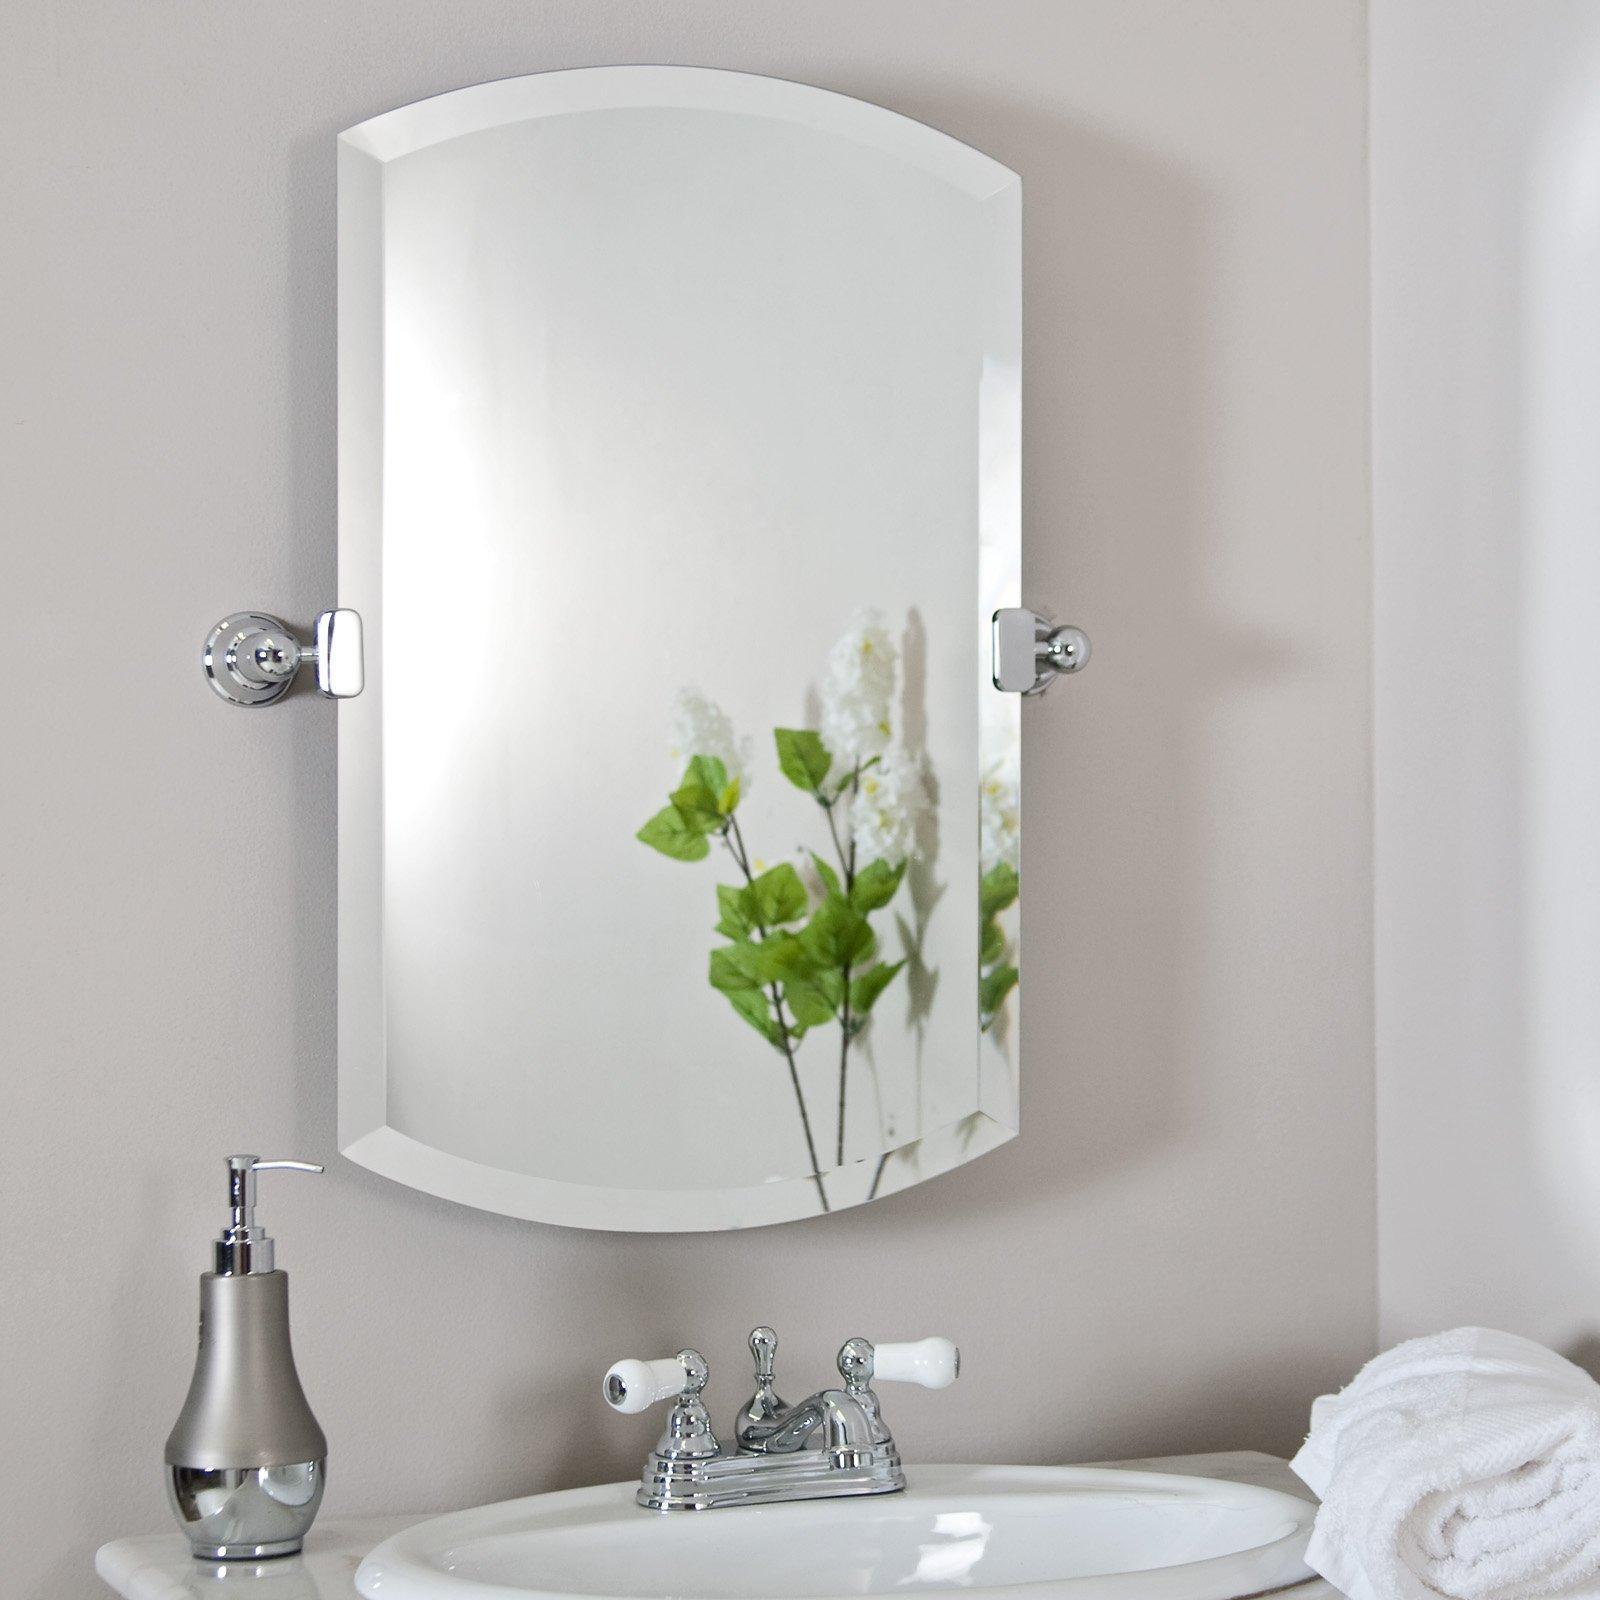 Bathroom Design Ideas (Image 10 of 20)